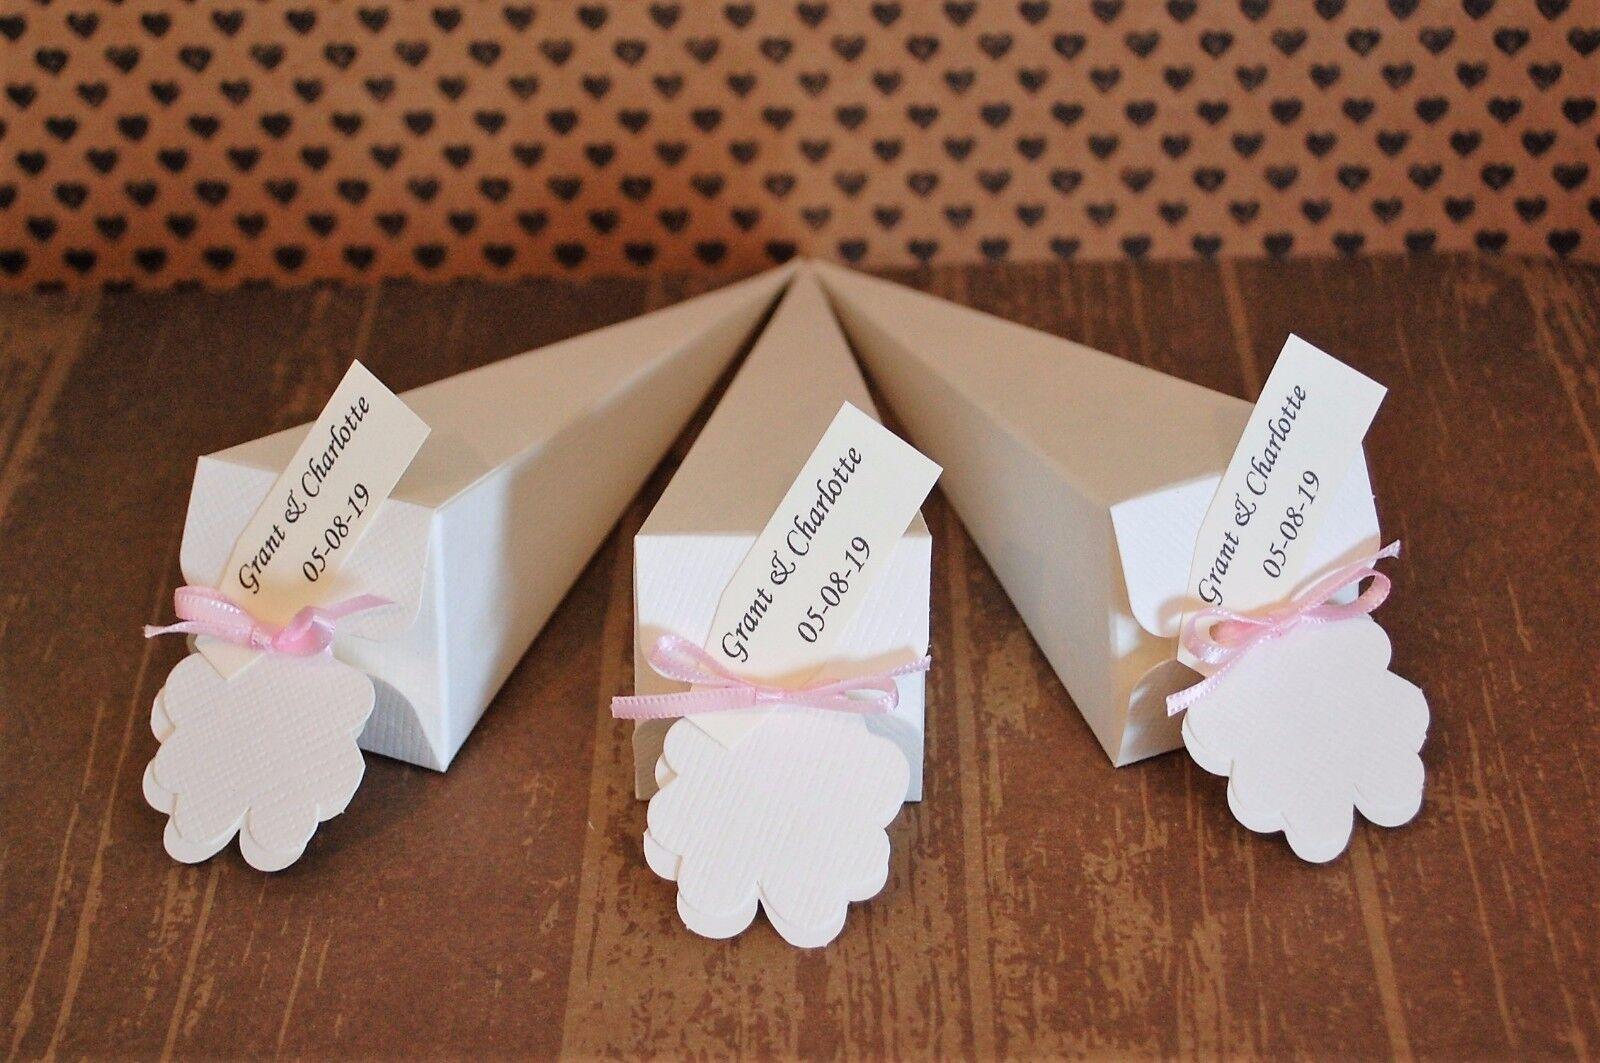 Nombres Personalizados relleno biodegradable Confeti Confeti biodegradable conos boda real Pétalo De Rosa 8e3e09